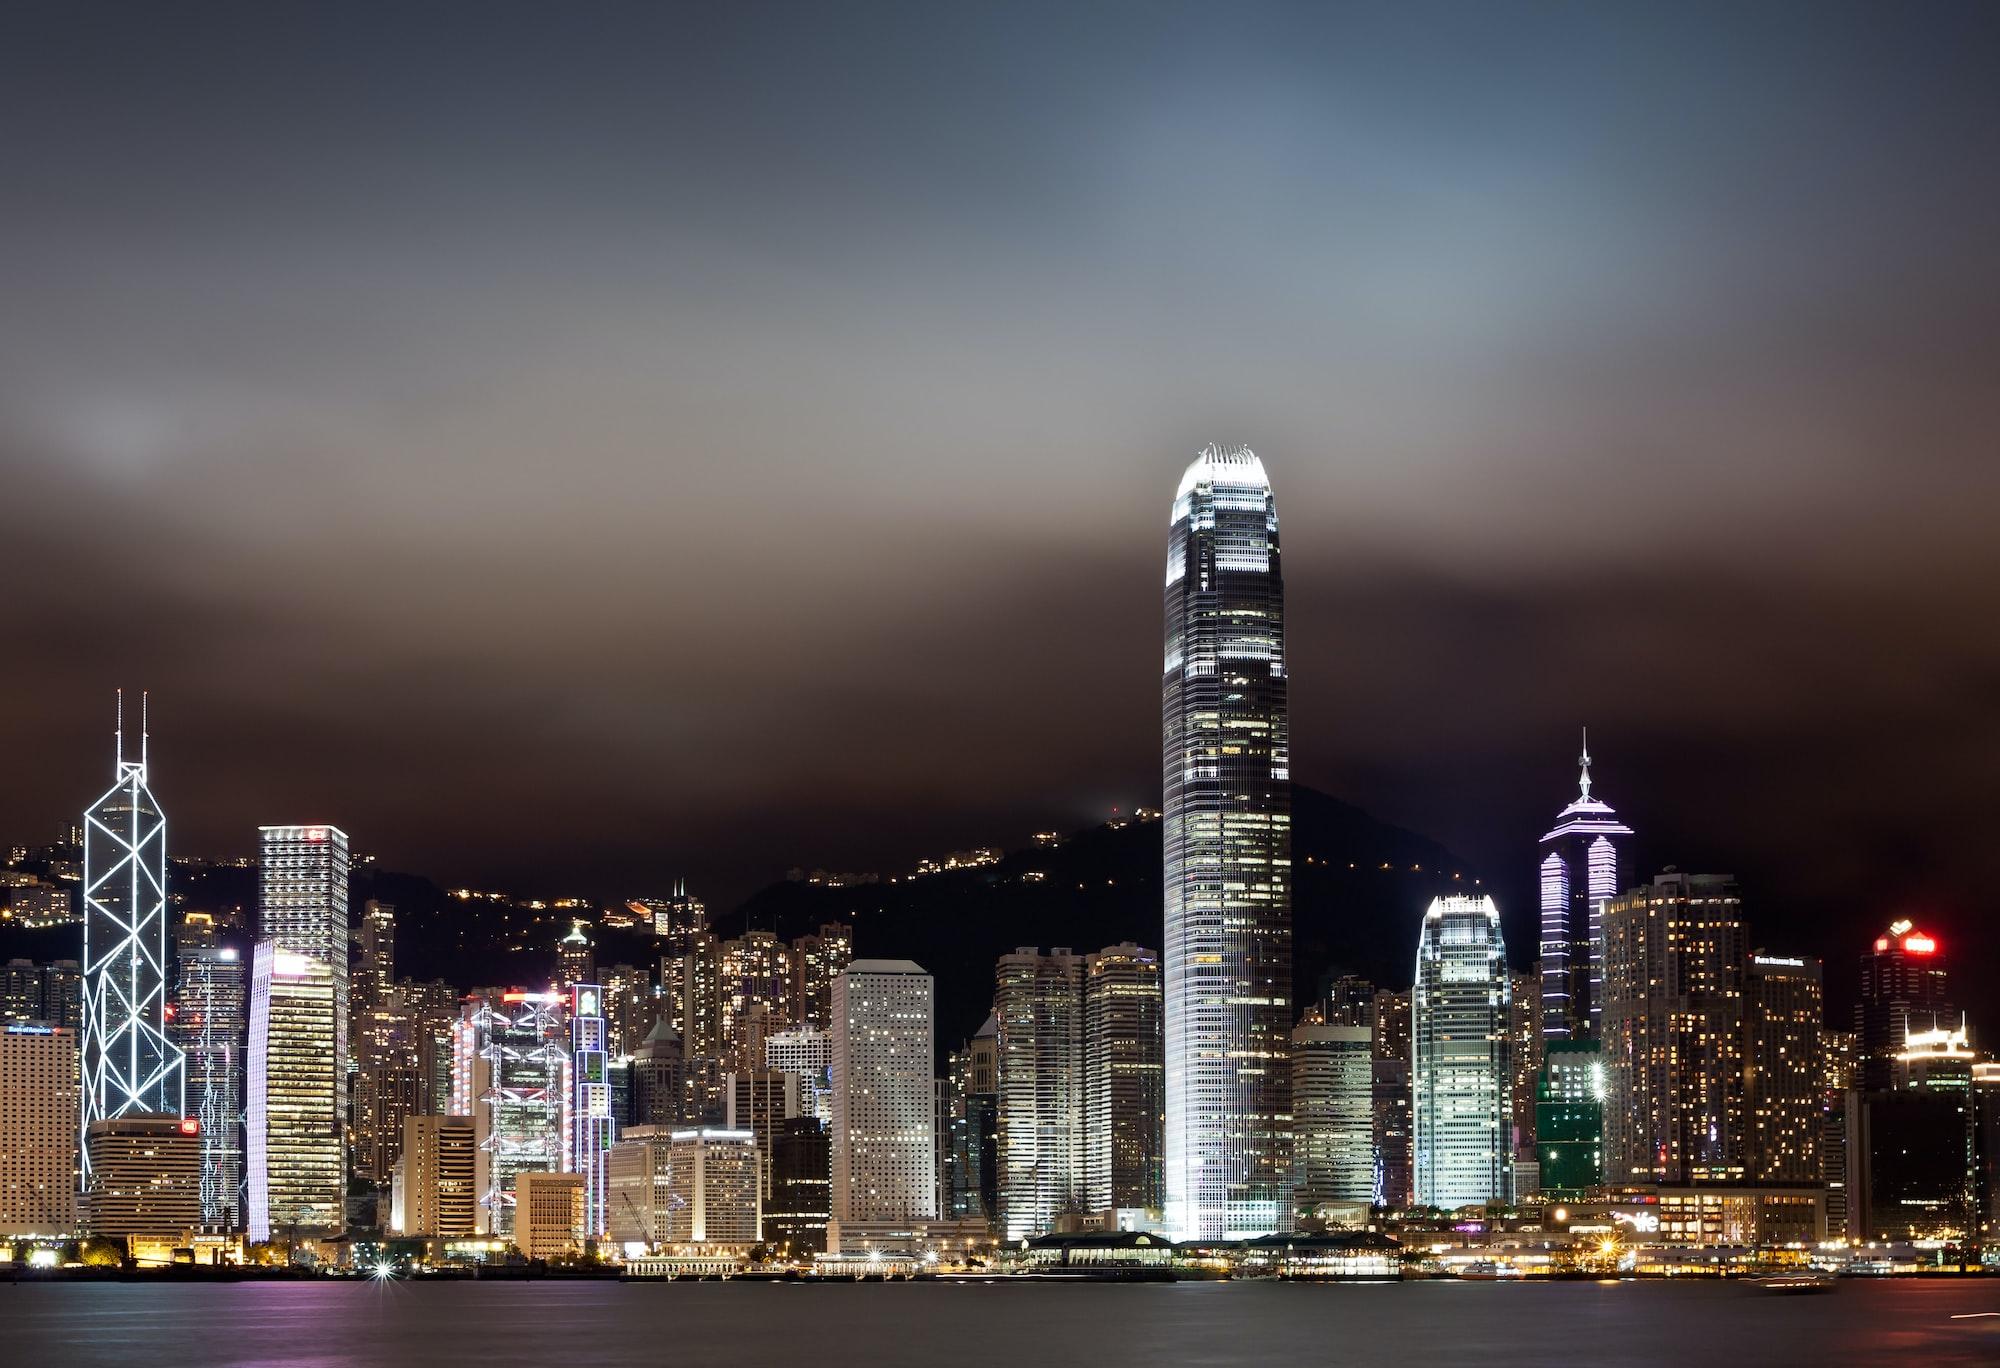 Hong Kong - Doubling down on danger!